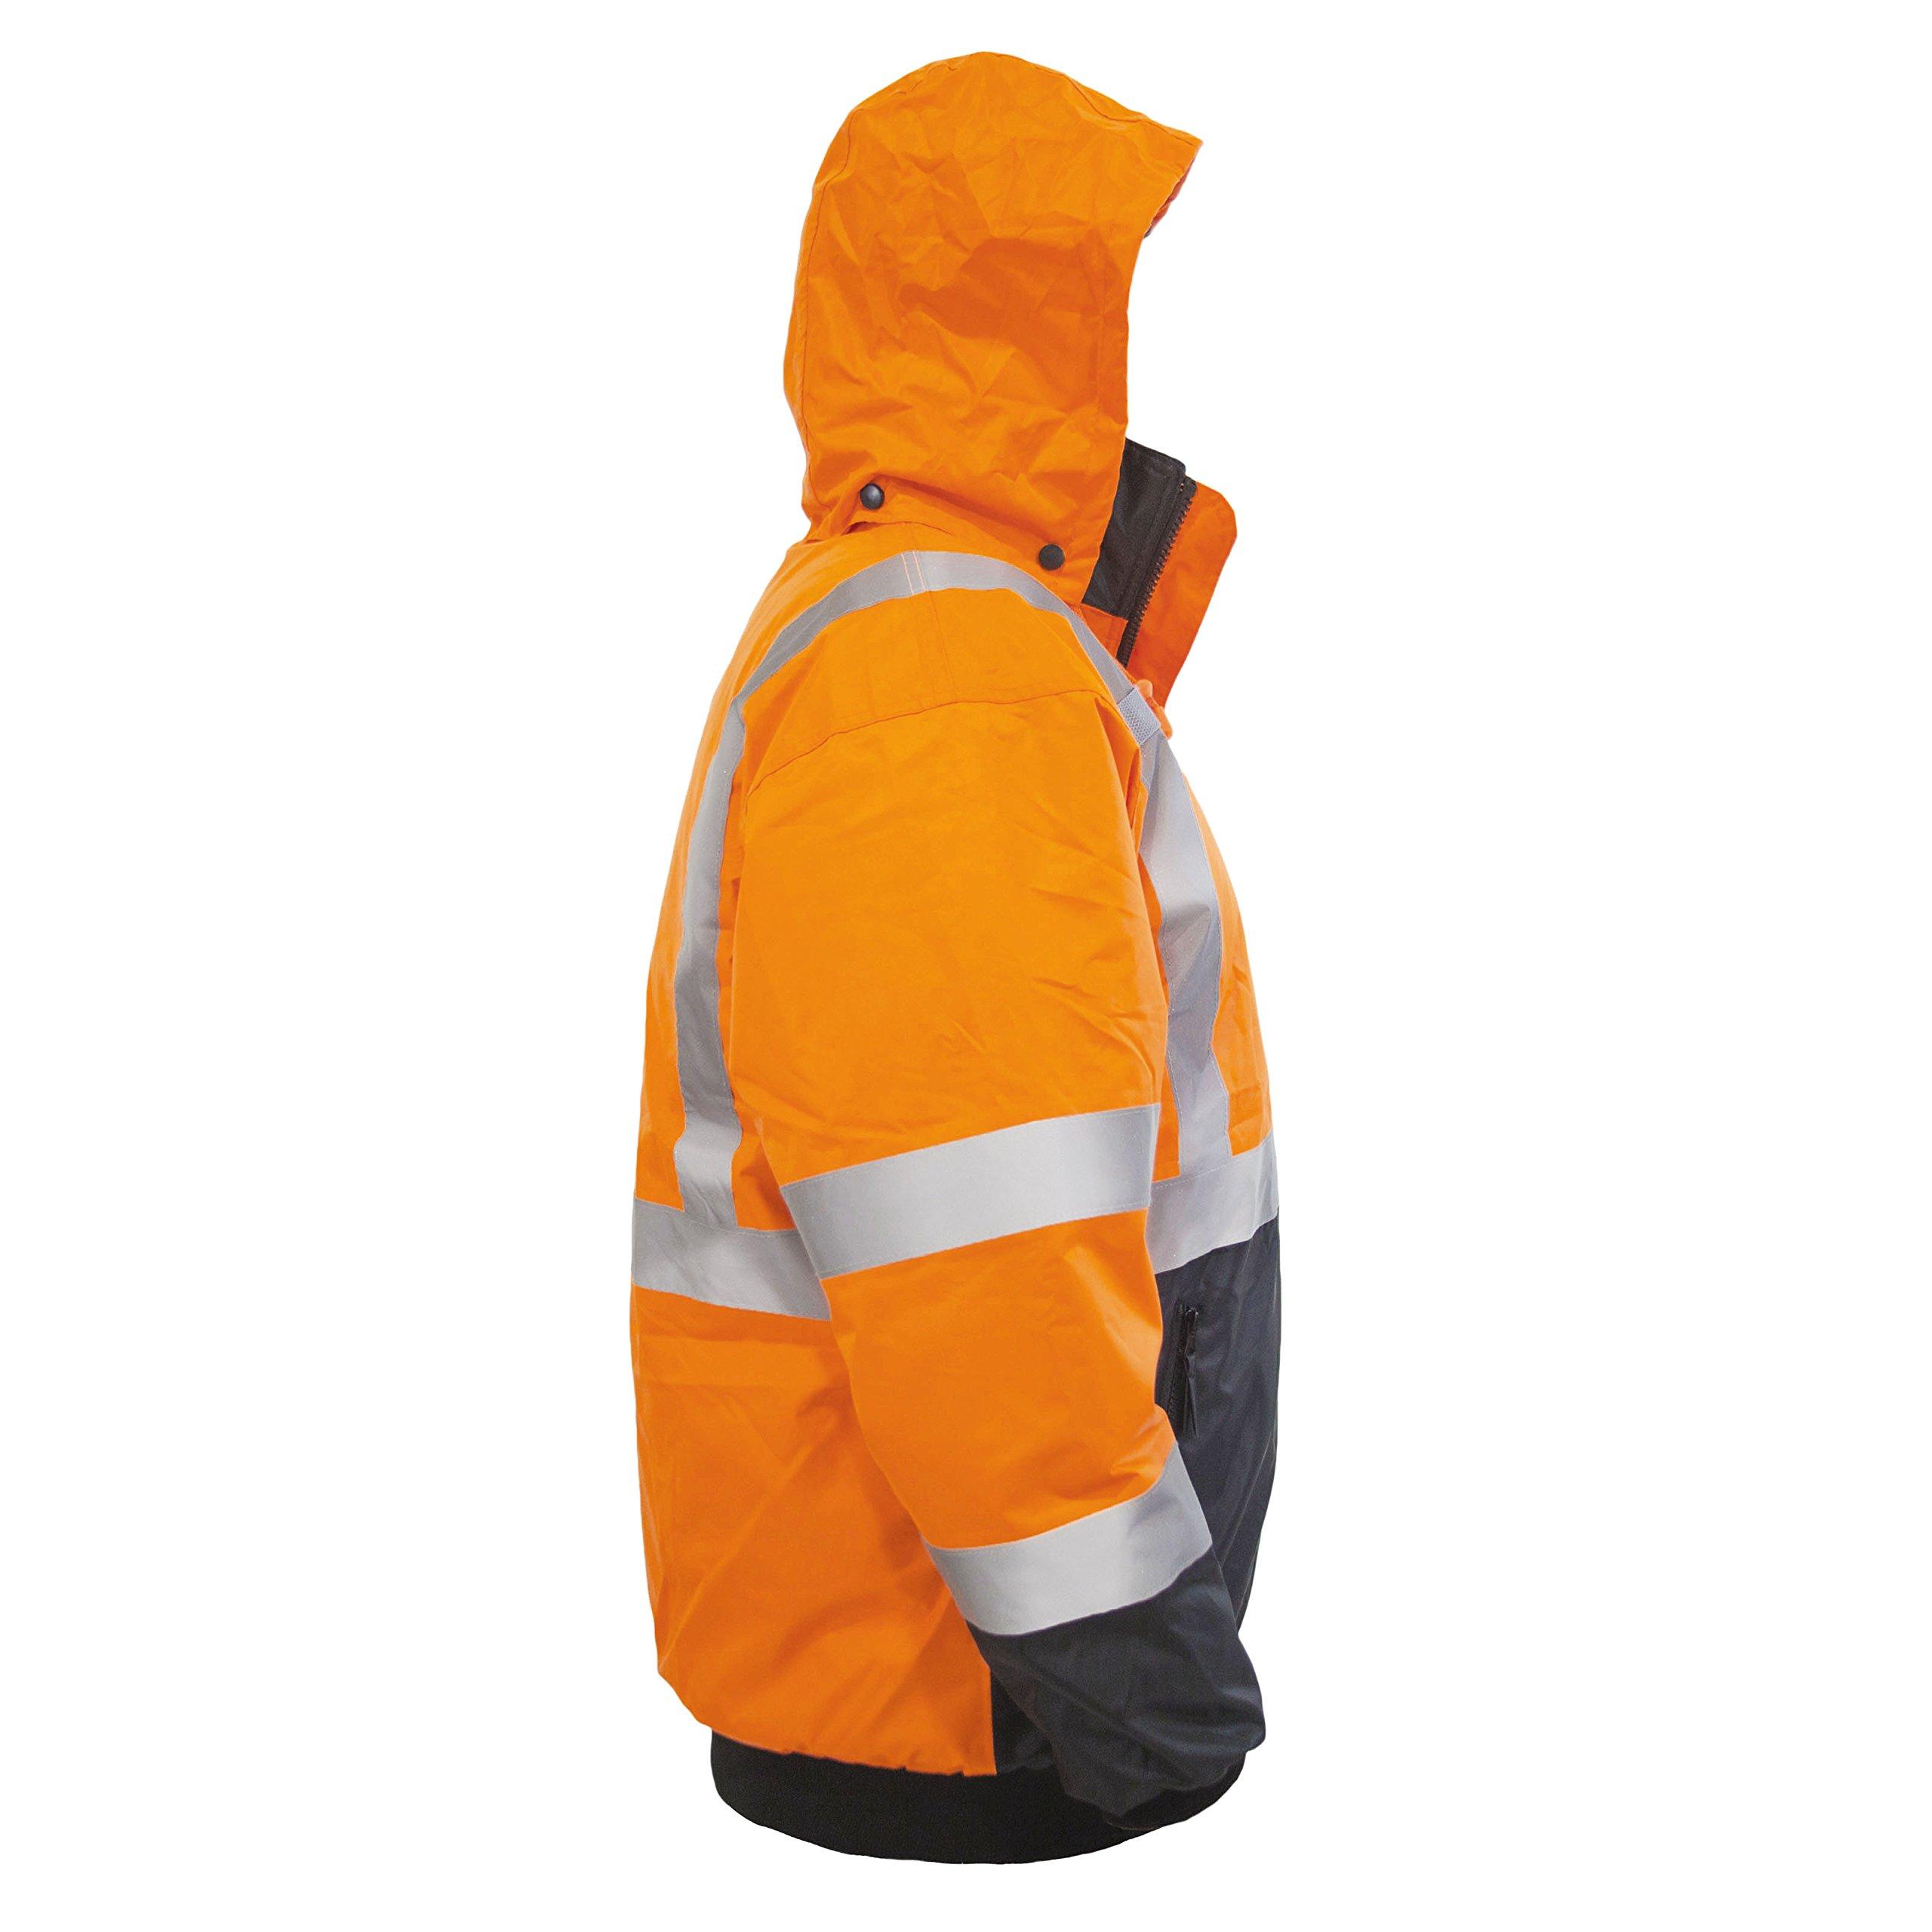 JORESTECH High Visibility Waterproof Bomber Jacket (3X-Large, Orange) by JORESTECH  (Image #4)